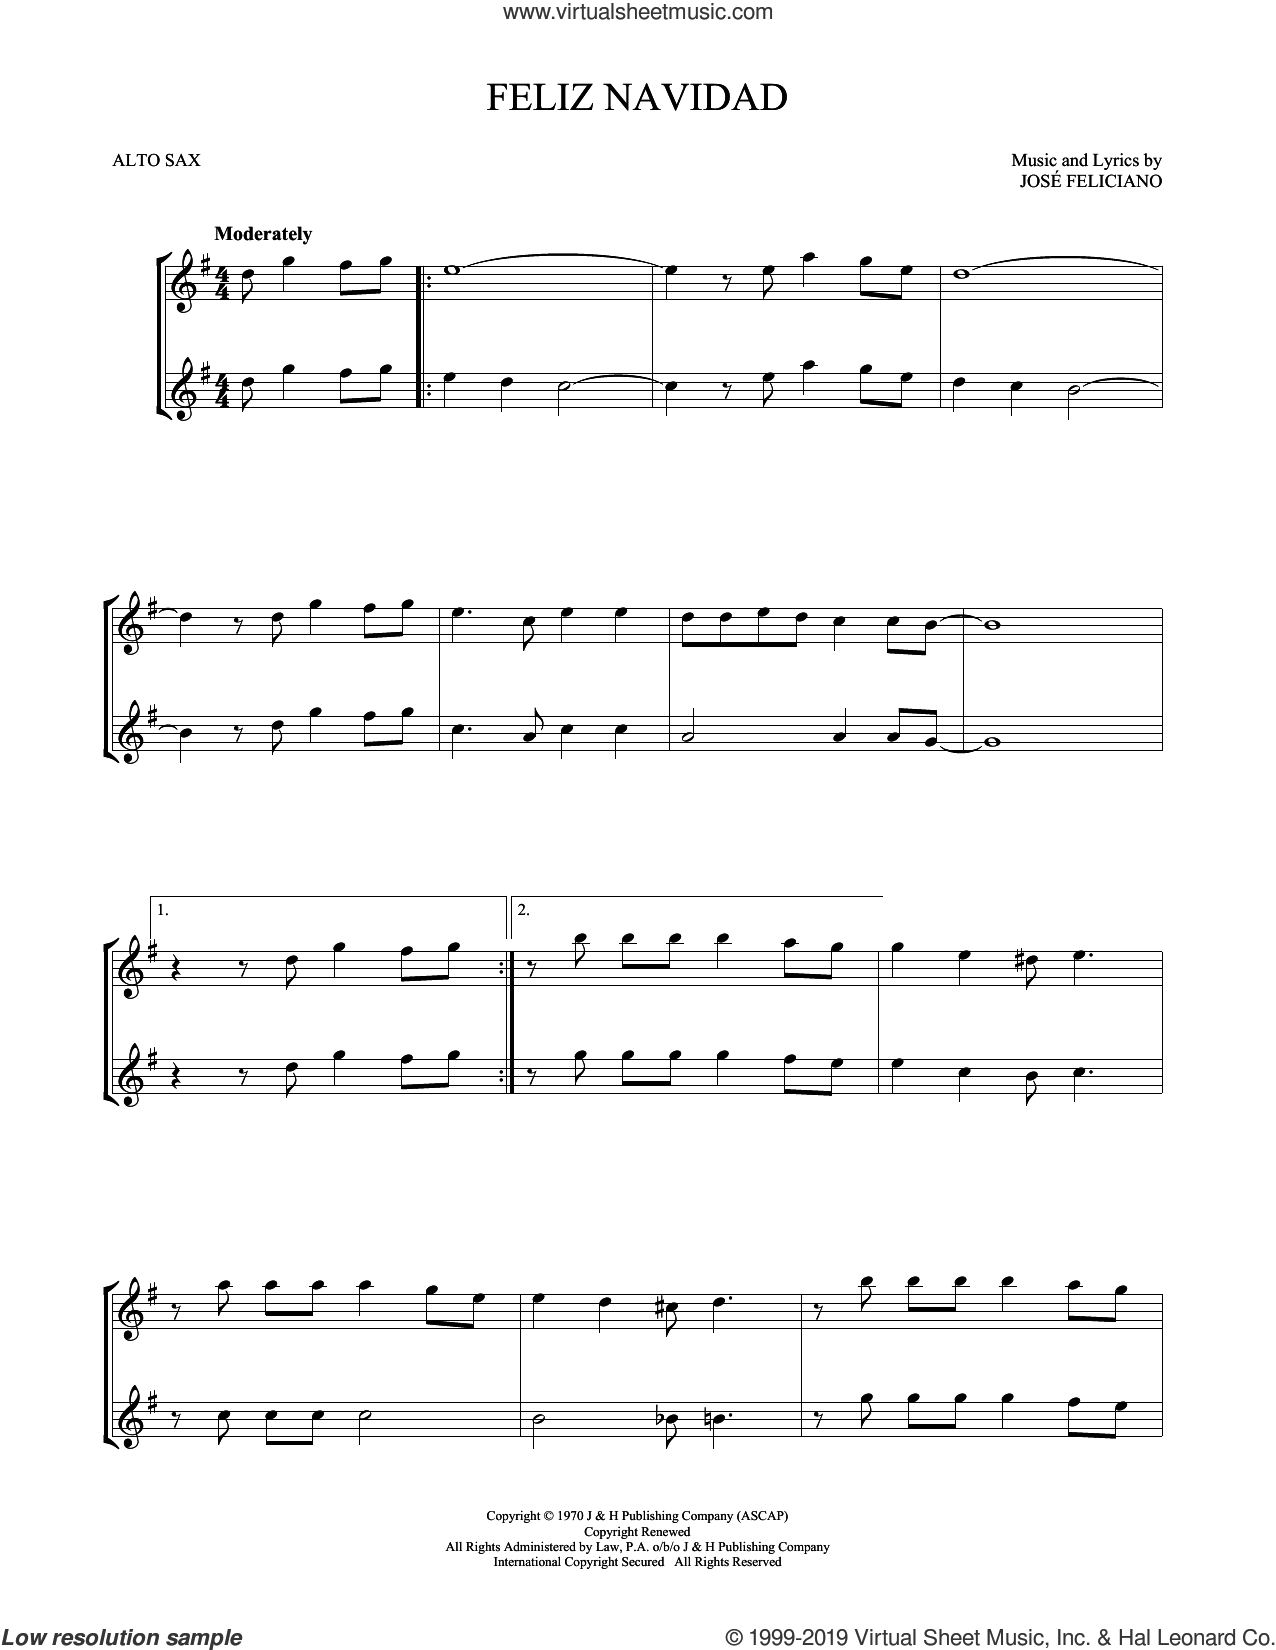 Feliz Navidad sheet music for two alto saxophones (duets) by Jose Feliciano, intermediate skill level